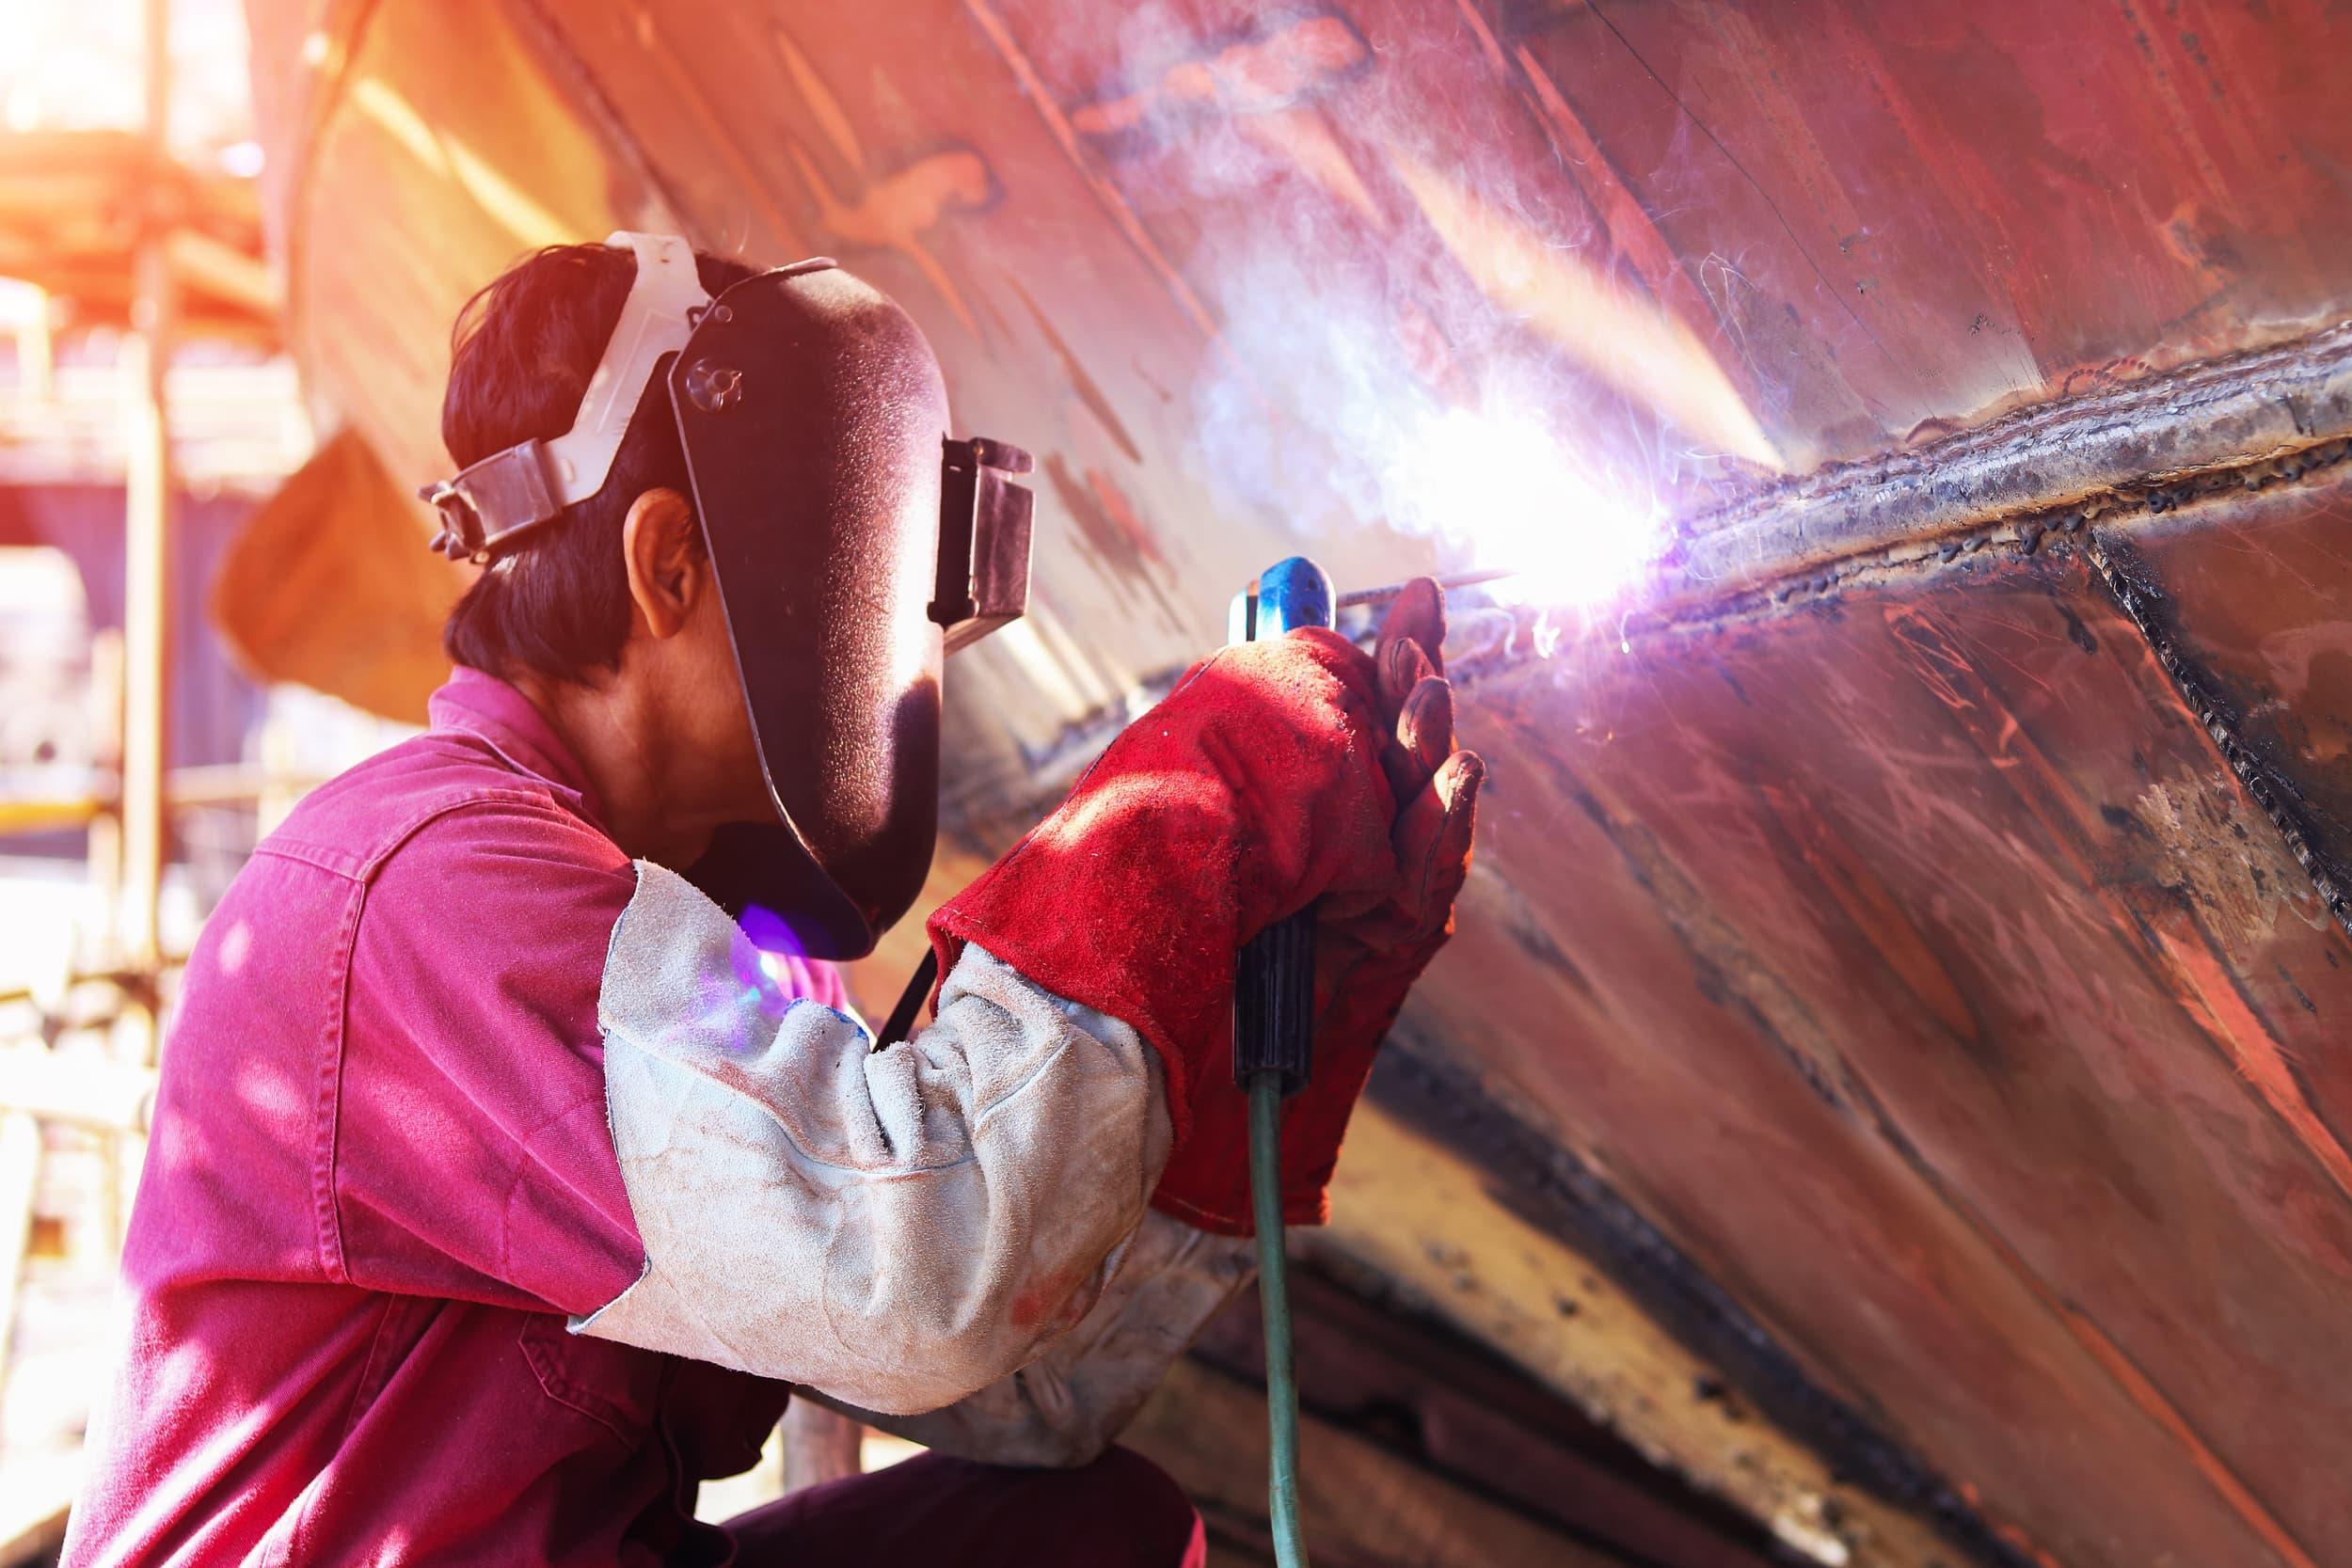 Compliance Training Online Shipyard Hot Work course